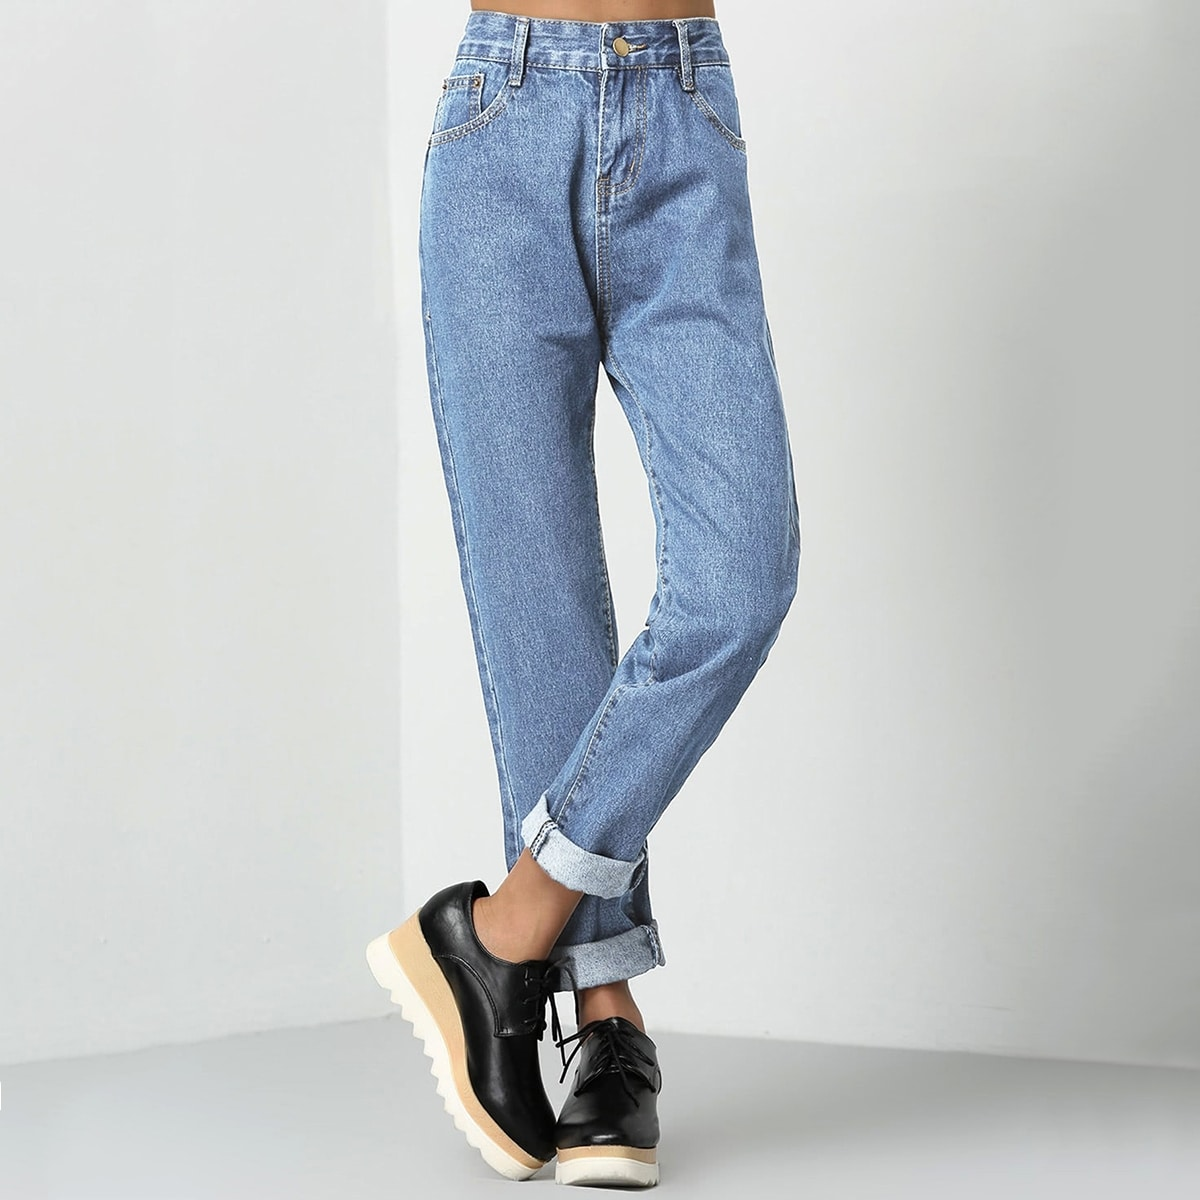 Opgerolde mom jeans